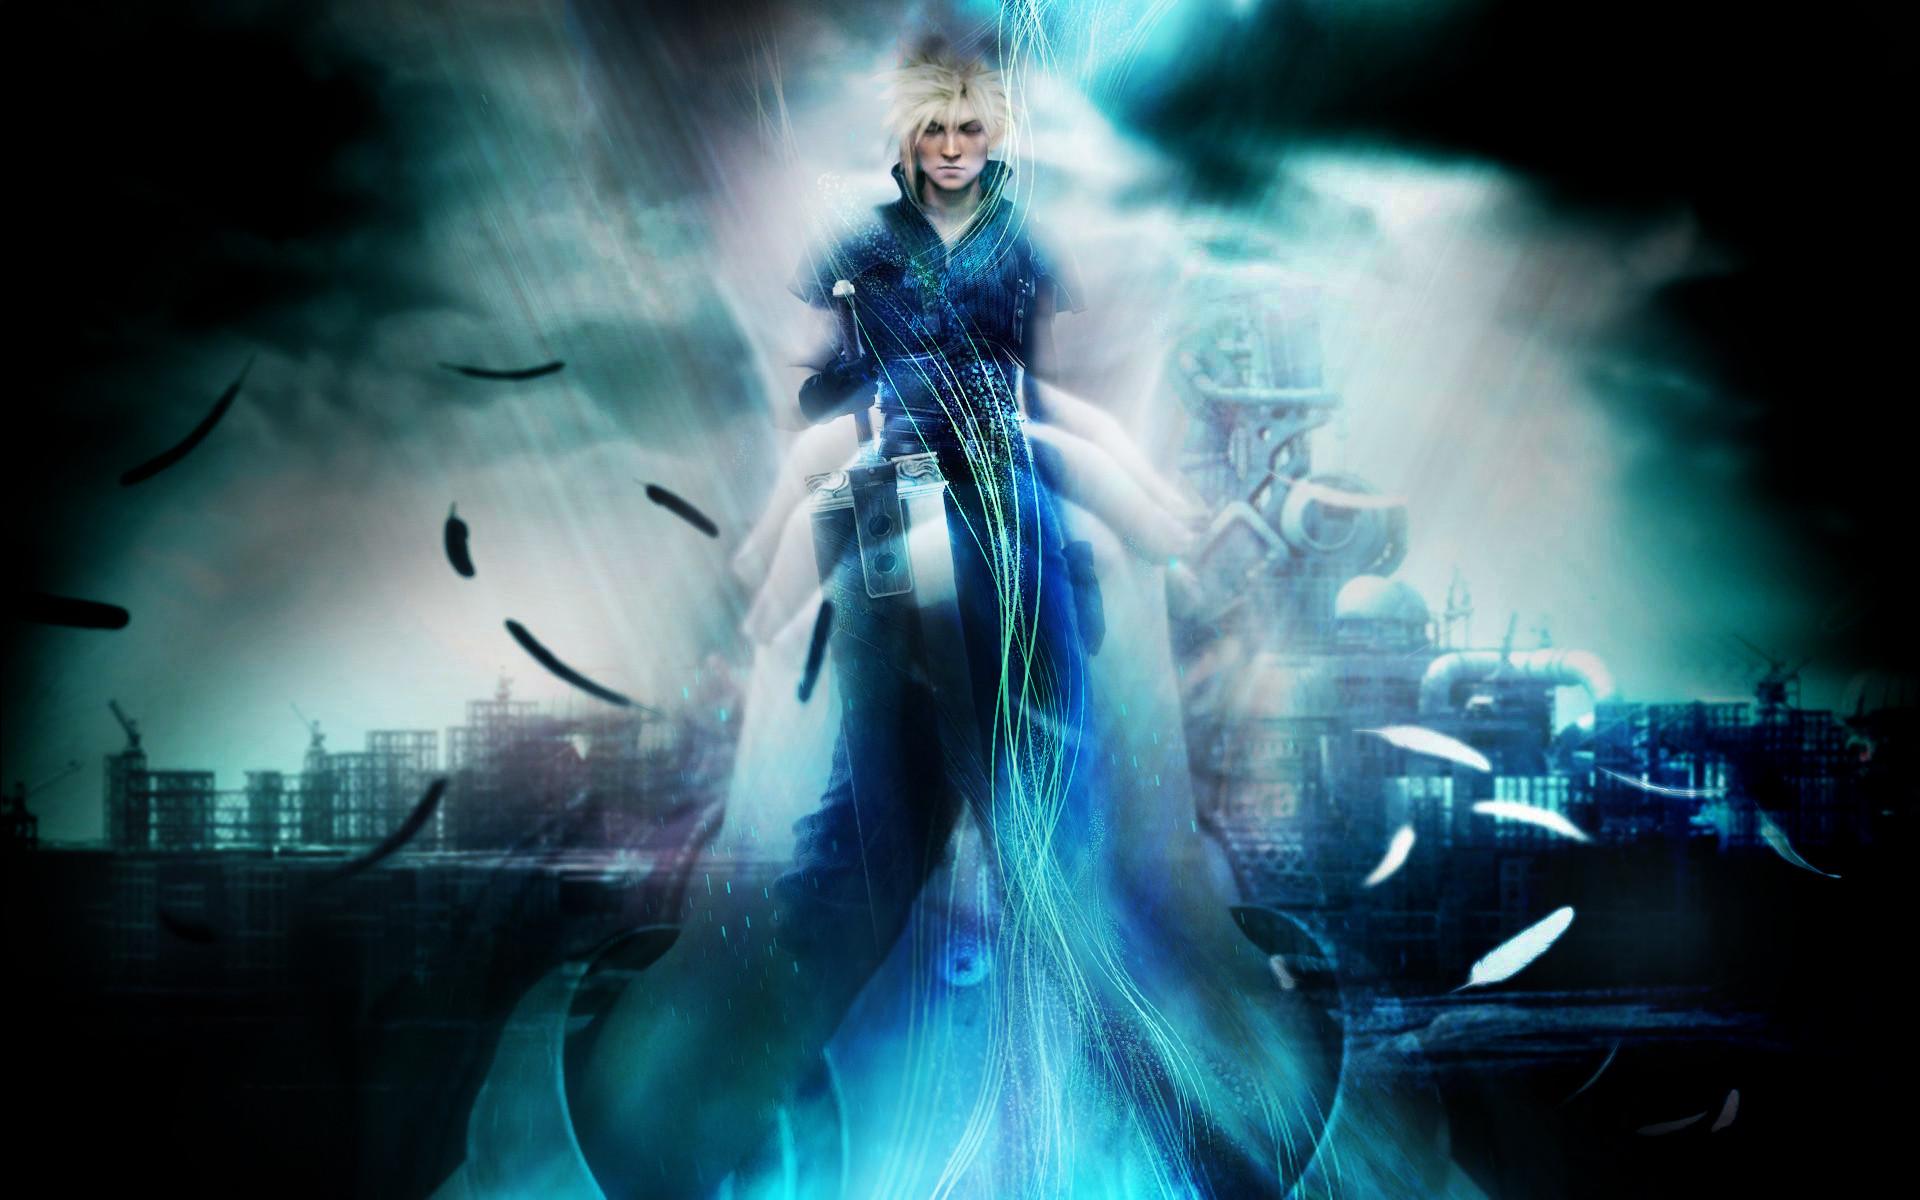 Tags: Anime, Final Fantasy VII, Aerith Gainsborough, Cloud Strife,  Lifestream,